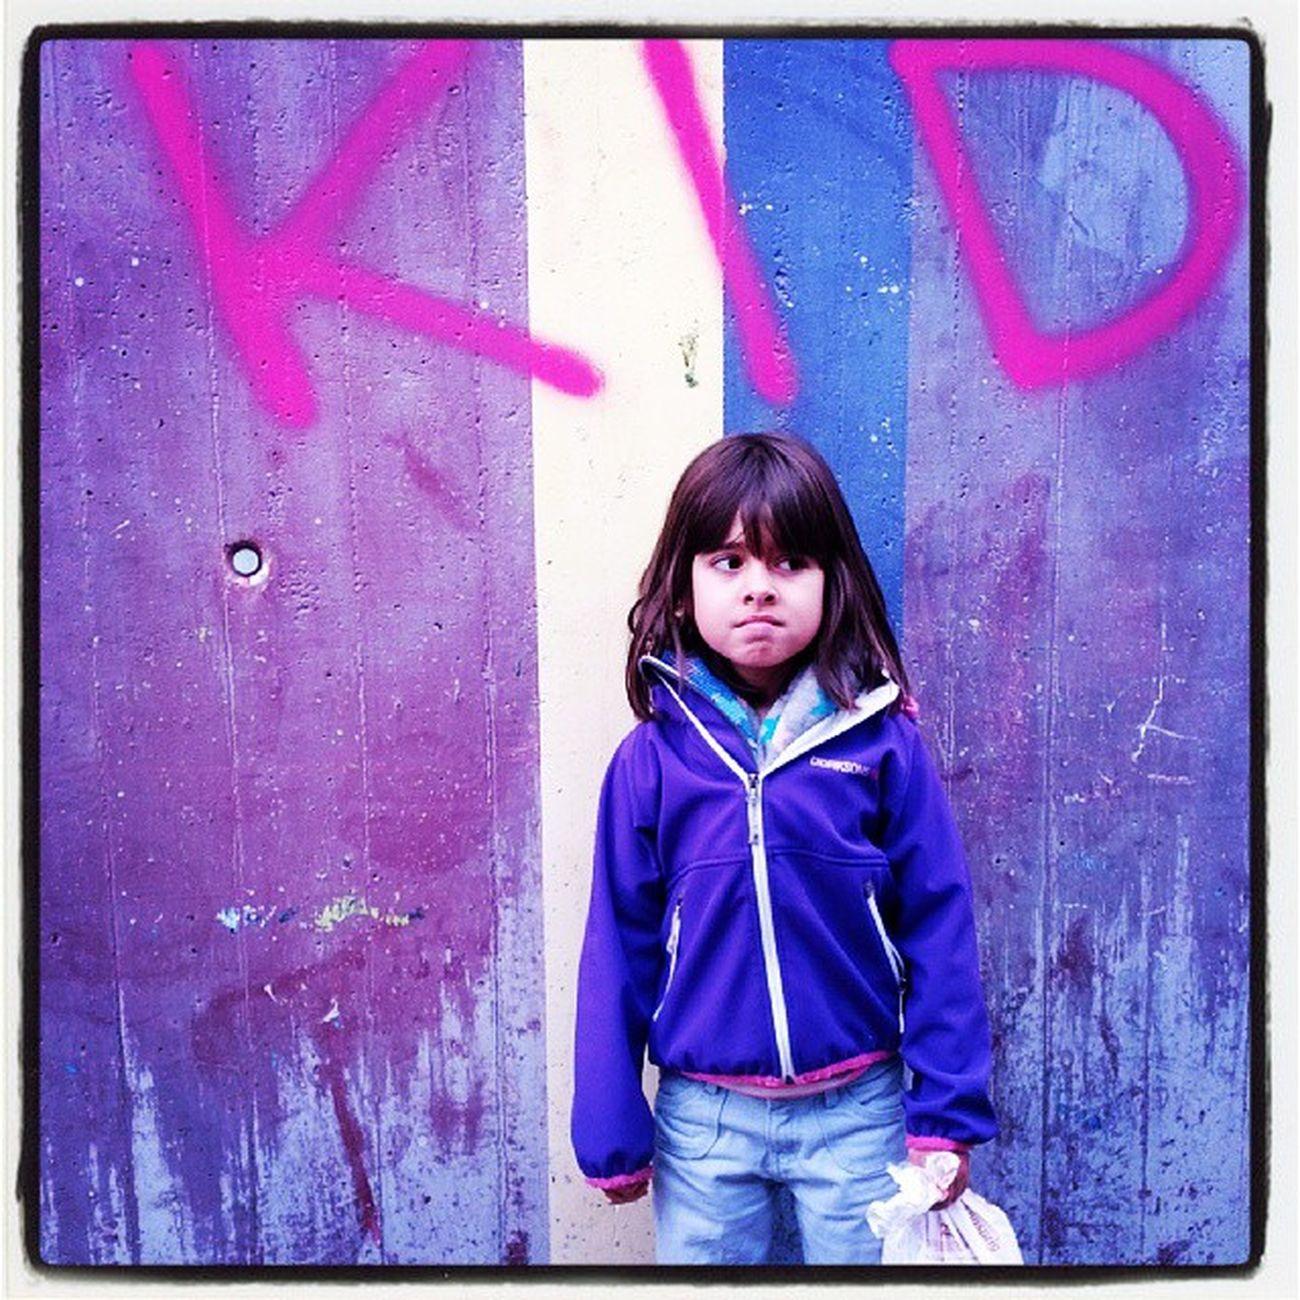 Graffiti Winterthur Switzerland Toocooltocare kid